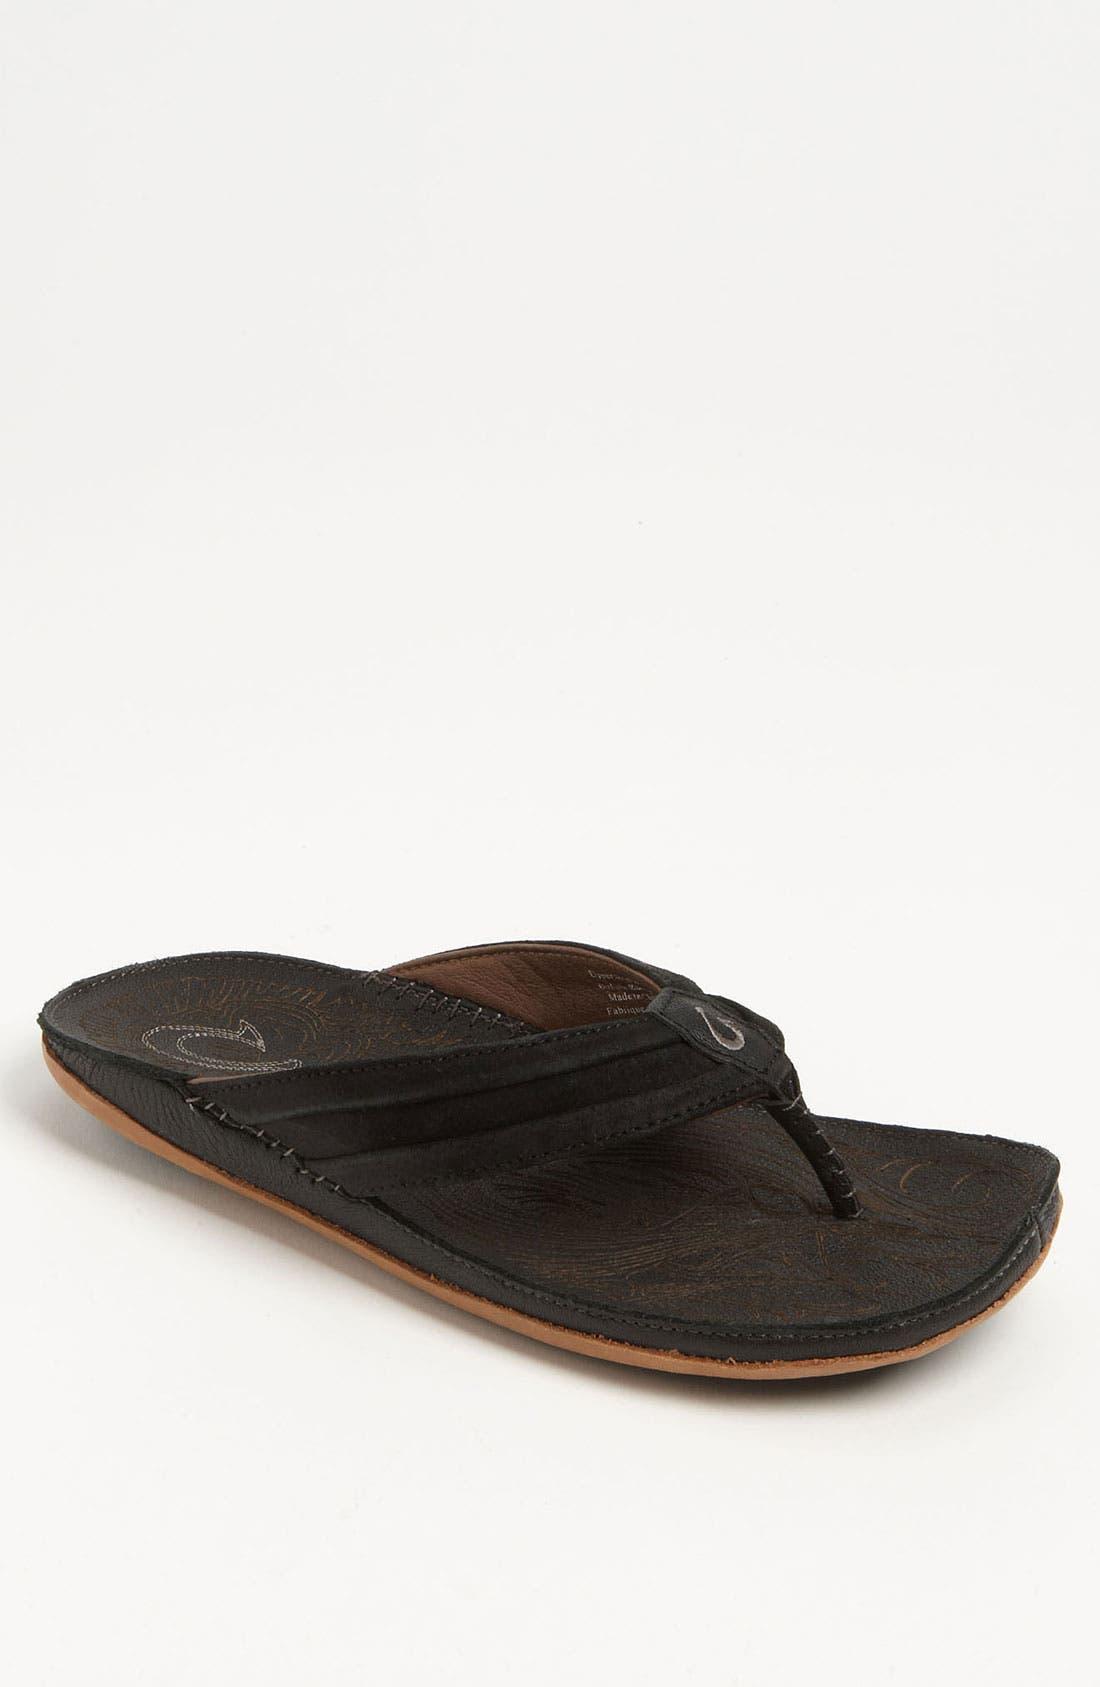 Main Image - OluKai 'Kava' Flip Flop (Men)